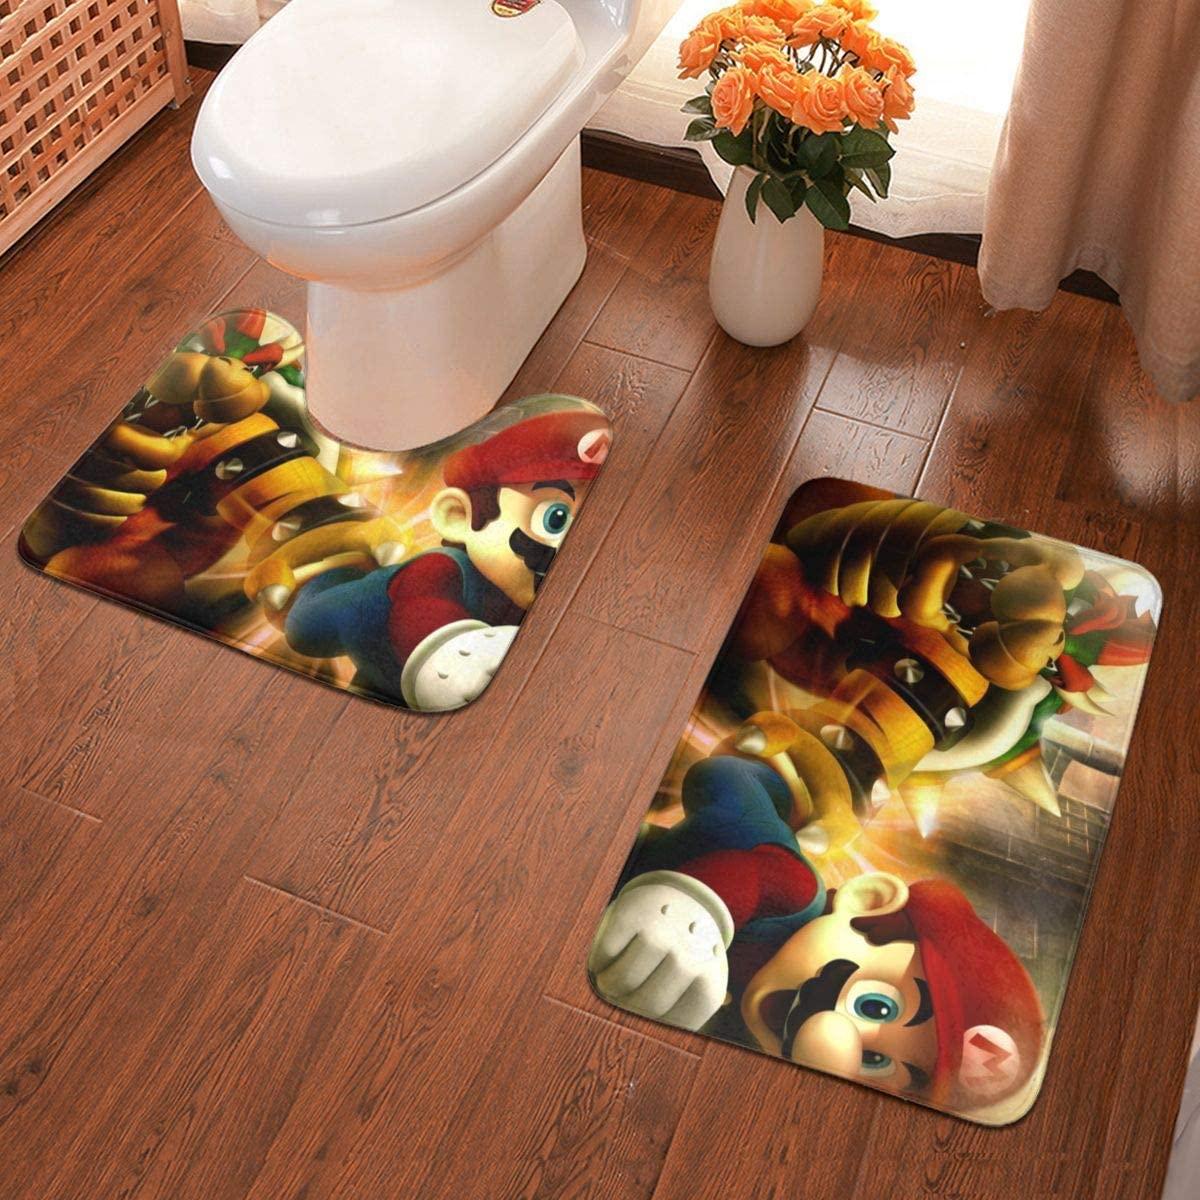 Boweike Mario Bathroom Antiskid Pad Non-Slip Bath Carpet Floor Mat Rug 2 Sets -Floor Mat+U-Shaped Pad, Toilet Washable Blanket Mats for Bathroom Home Shower